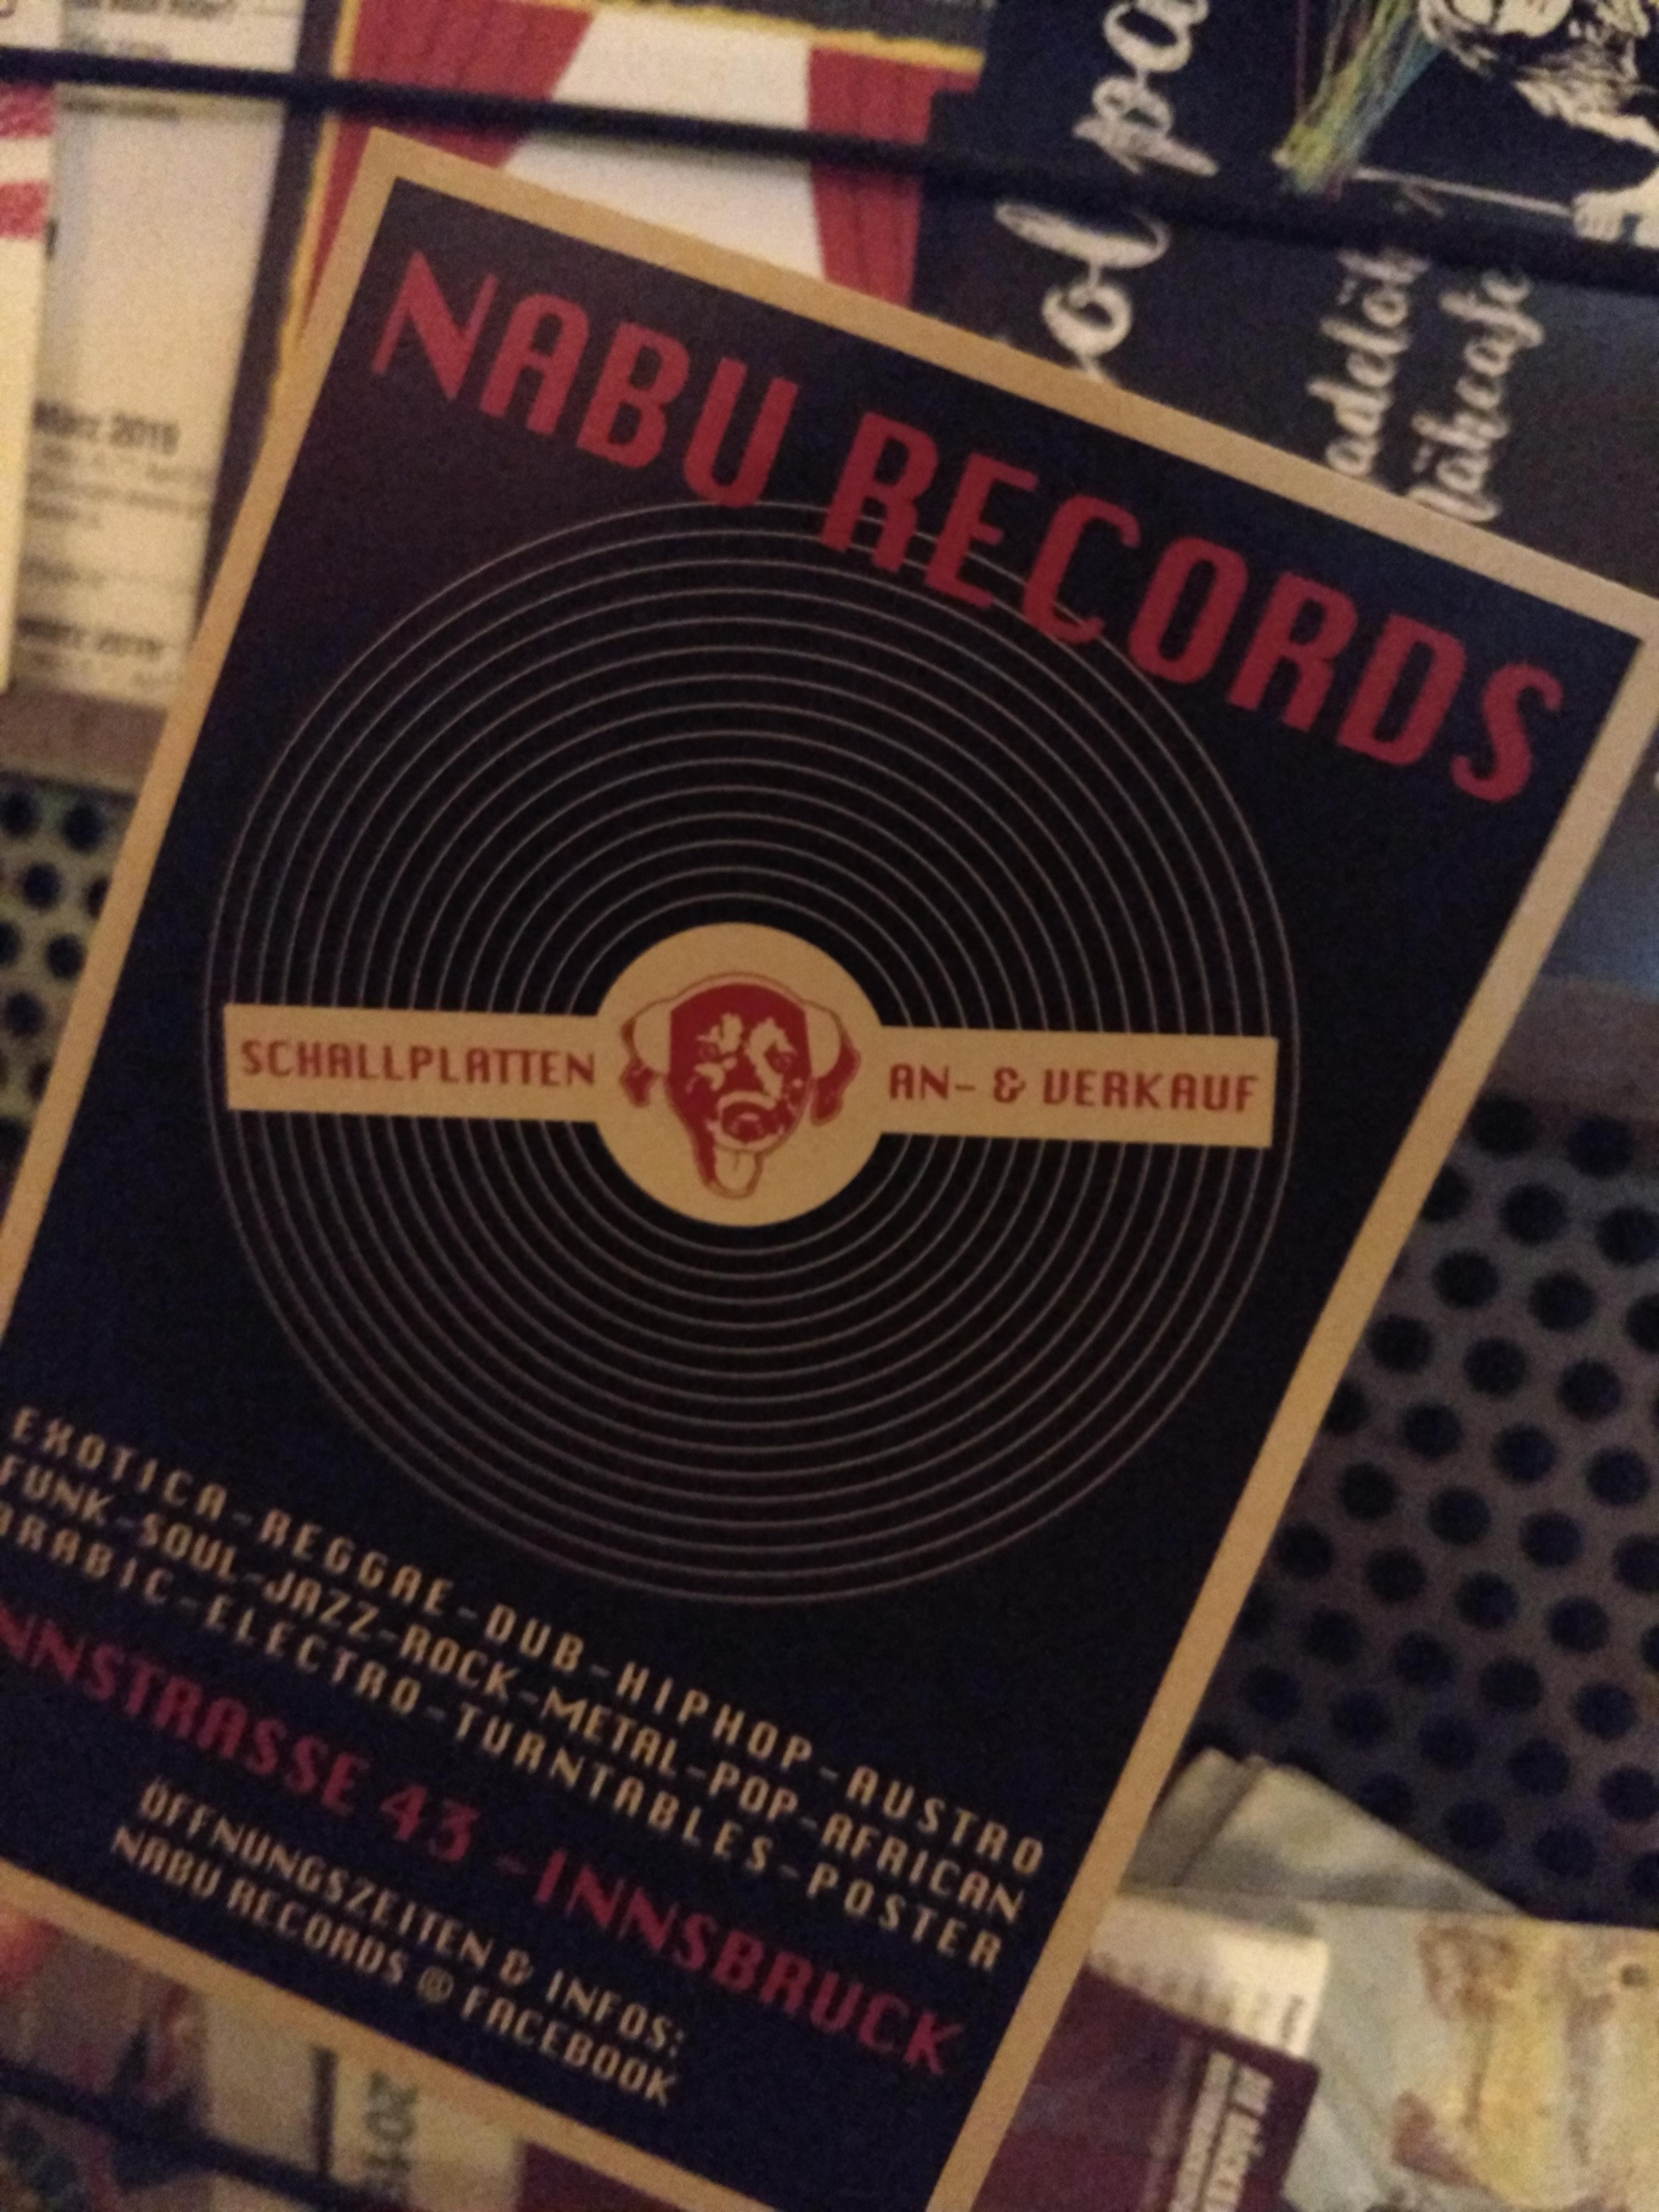 "A flyer for a business in Innsbruck: ""NABU RECORDS: Schallplattn An- und Verkauf.  Exotica - Reggae - Dub - Hiphop - Austro Funk - Soul - Jazz - Rock - Metal - Pop - African - Arabic - Electro - Turntables - Poster"""